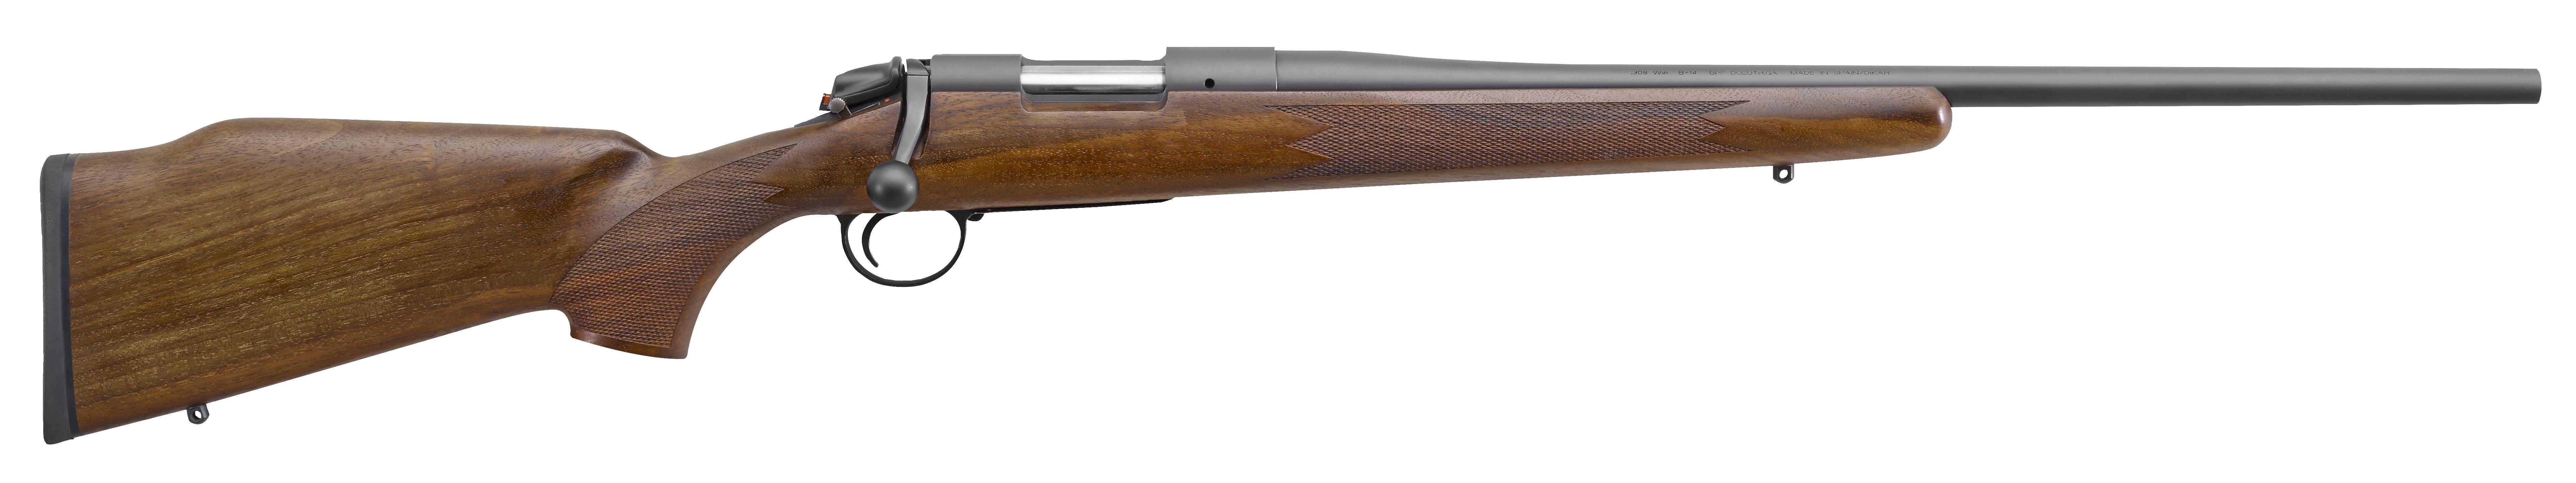 Bergara Timber .270 Win Bolt Action Rifle, Walnut Stock - B14L002